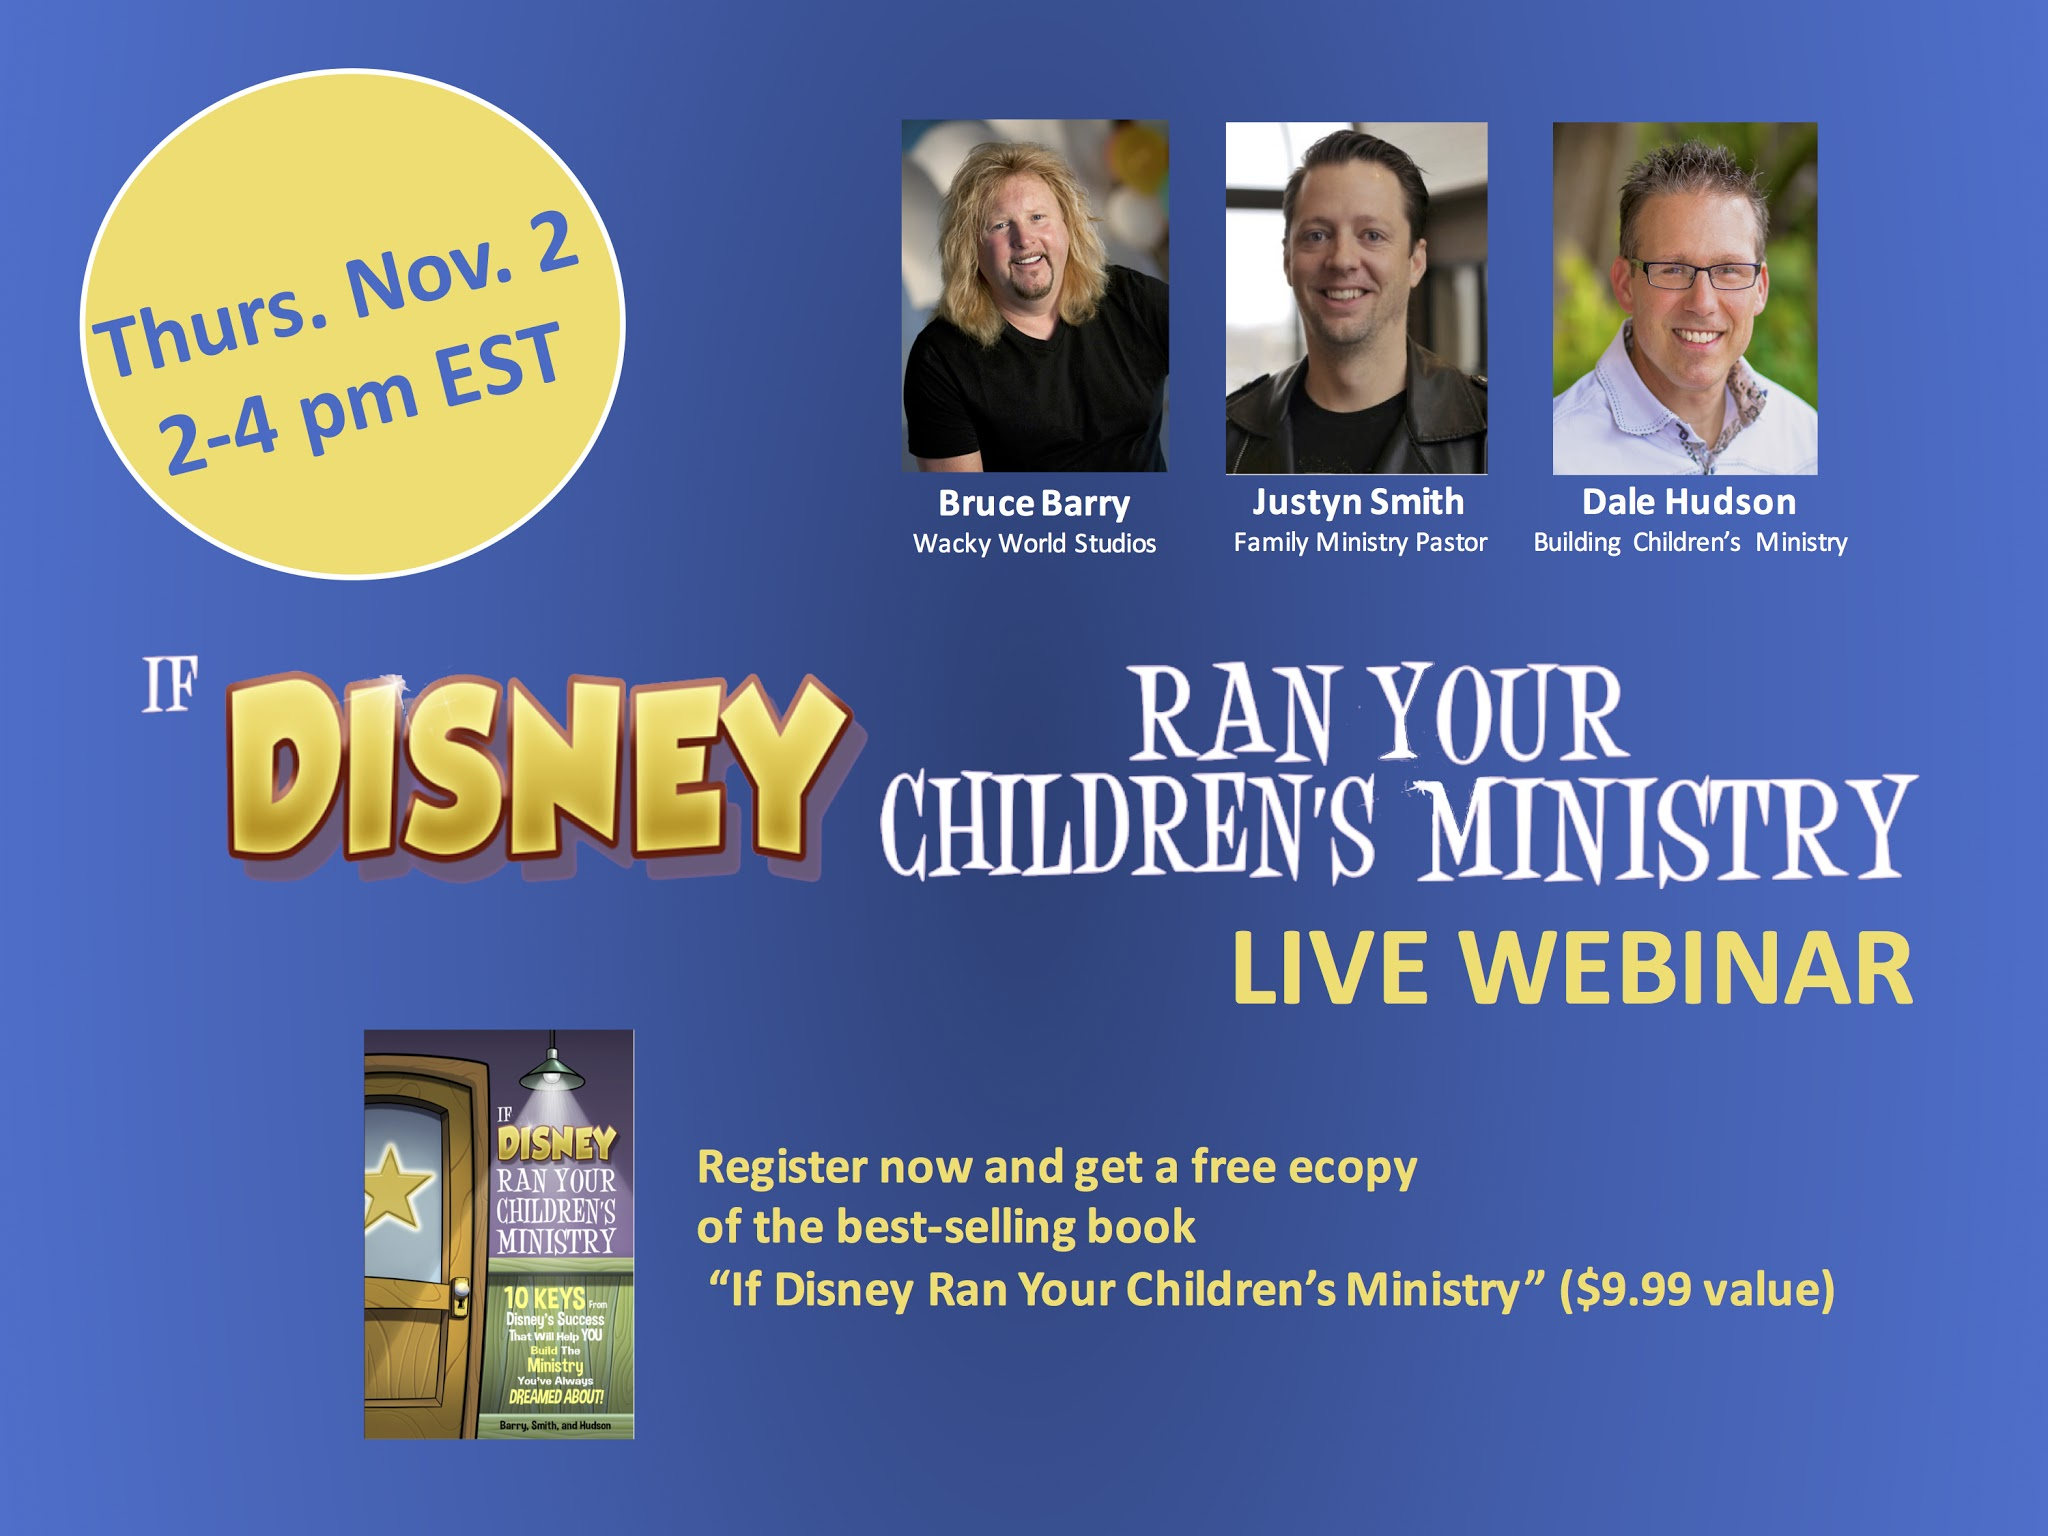 disney kidmin webinar coming nov. 2nd! ~ relevant children's ministry